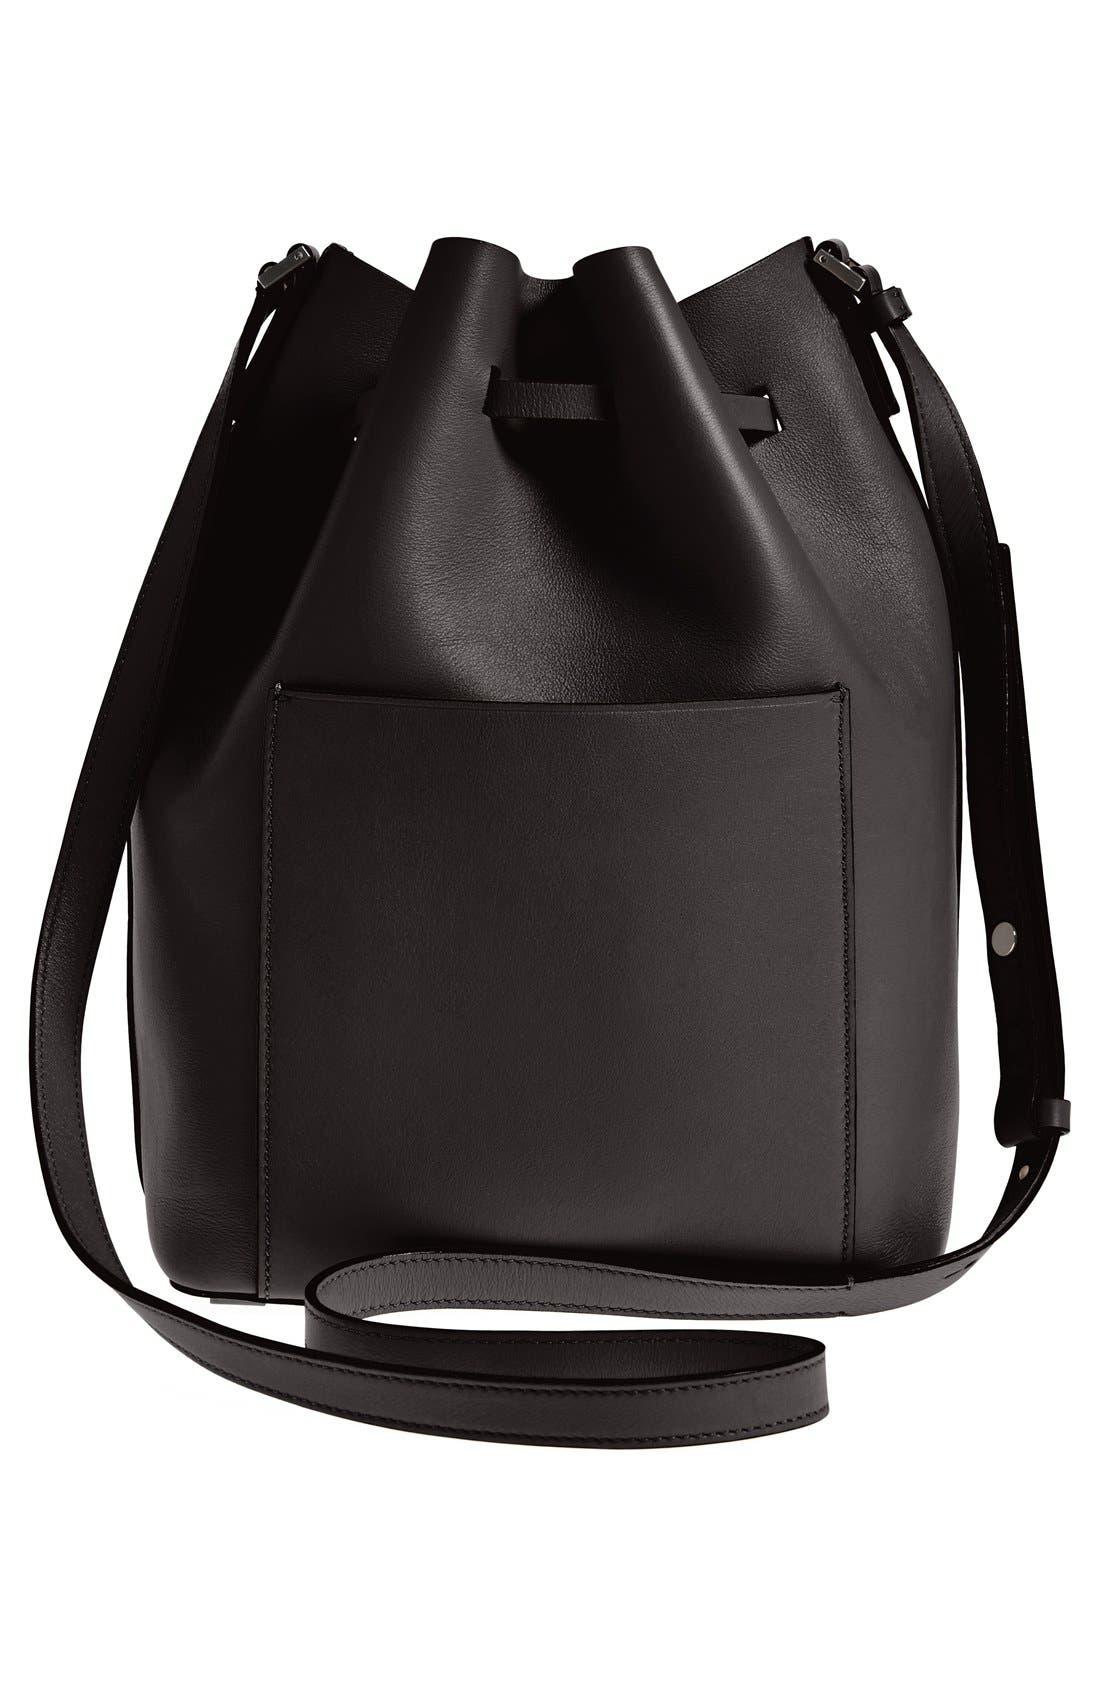 Alternate Image 2  - Michael Kors 'Large Miranda' Leather Bucket Bag